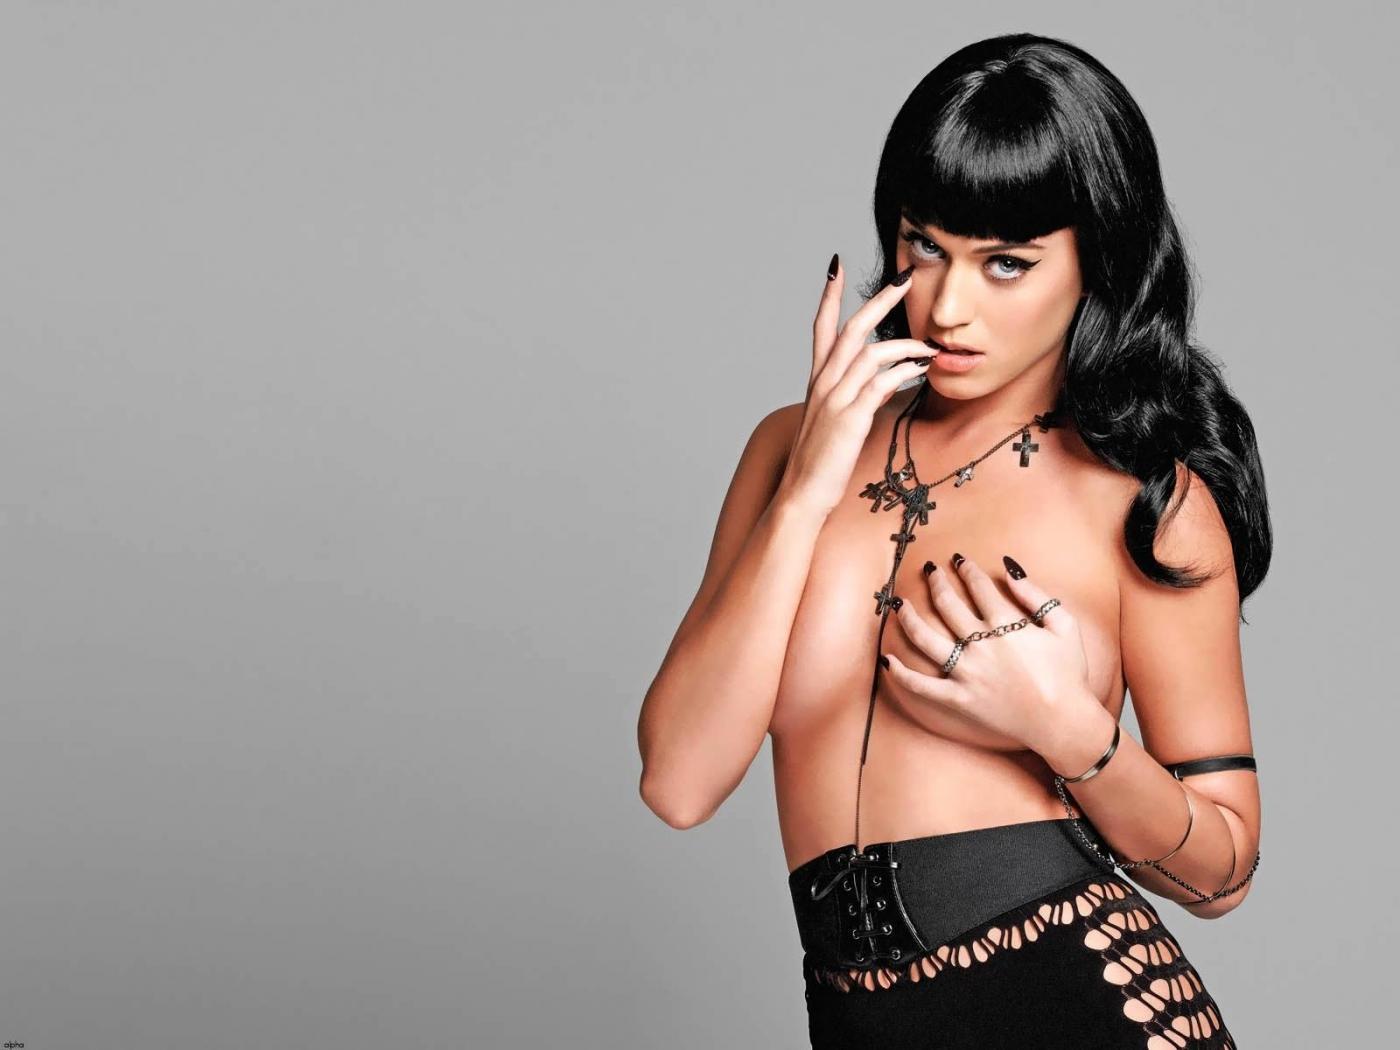 http://3.bp.blogspot.com/-HYh0XGqE9mI/T0kF-aLB8cI/AAAAAAAAD5Y/c93_UdjPJt4/s1600/sexy+katy+perry+wallpaper+without+bra+half+naked.jpg